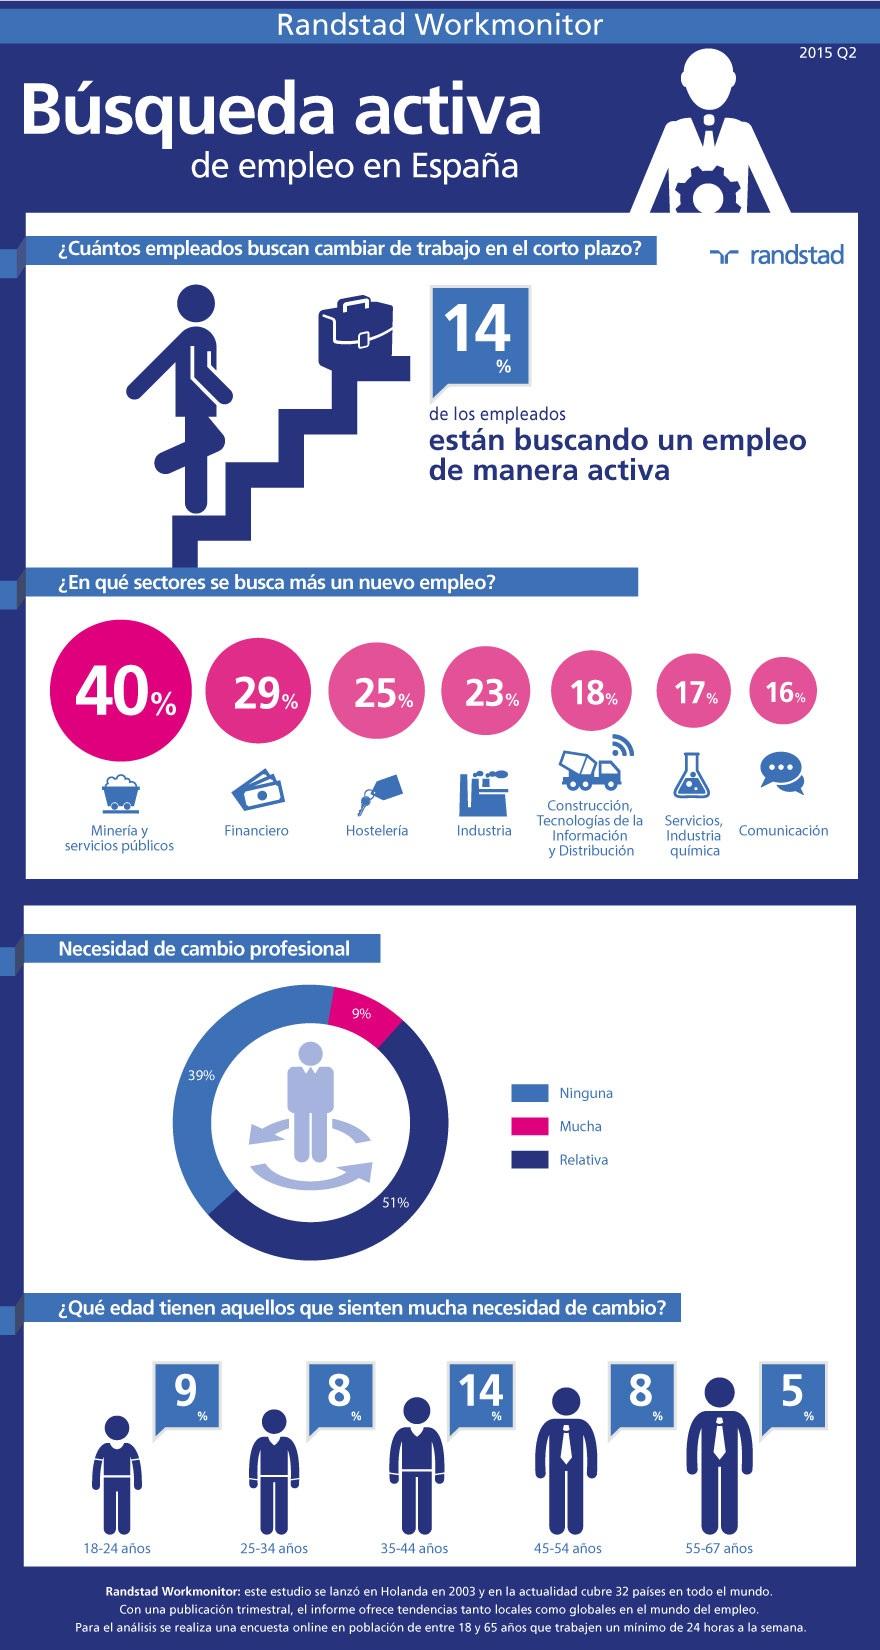 infografia-busqueda-activa-de-empleo-workmonitor-q2-2015.jpg